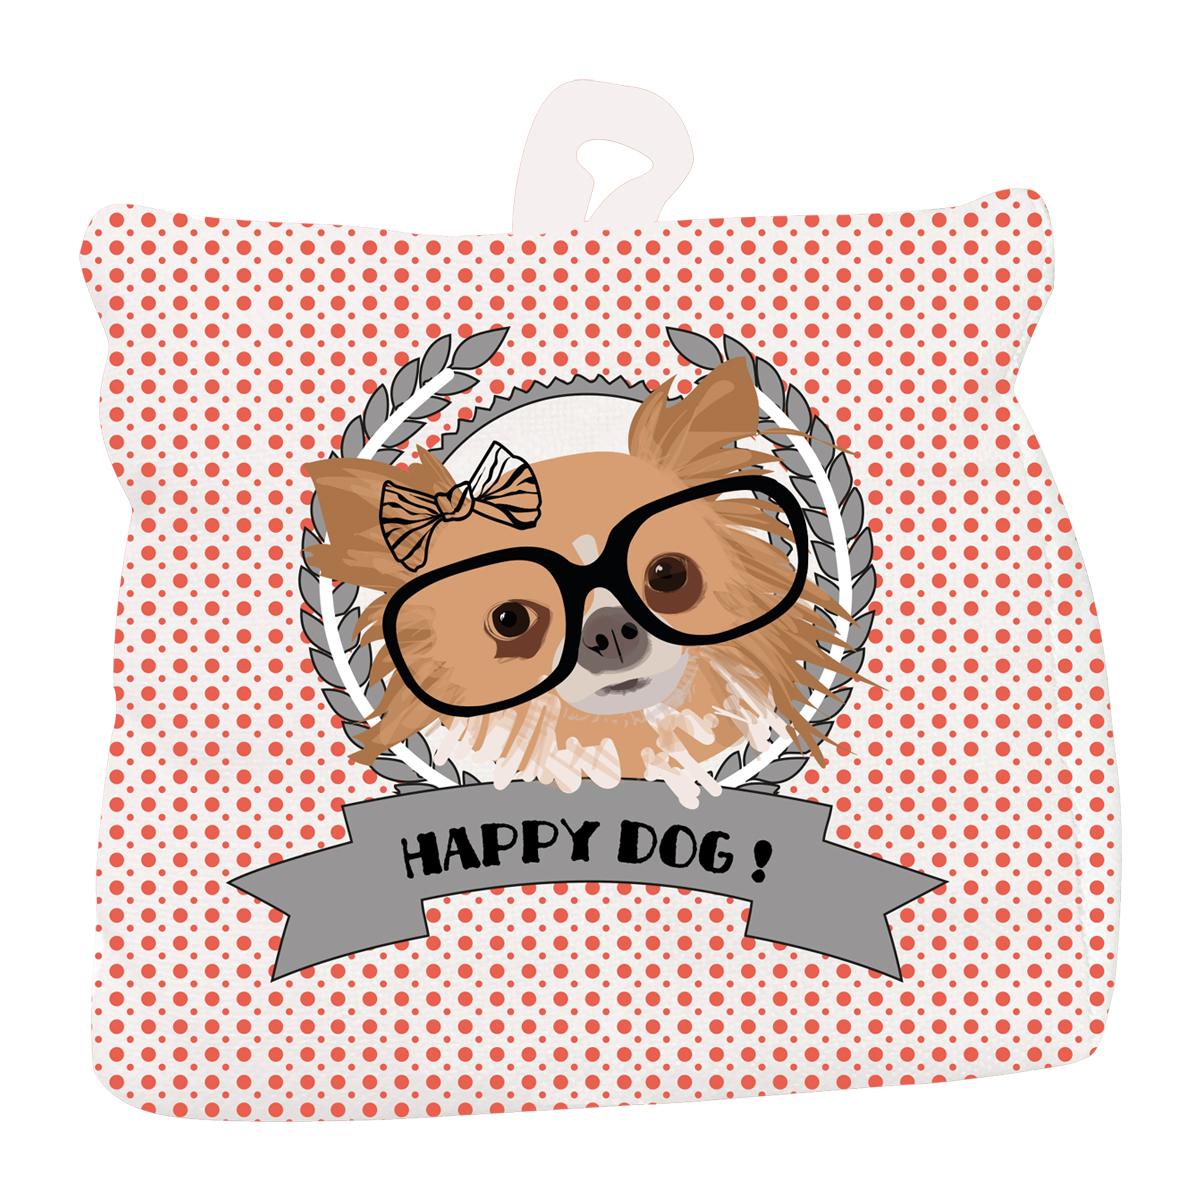 Cale porte coton \'Happy Dog\' rose  (Chihuahua) - 18x18 cm - [Q4018]